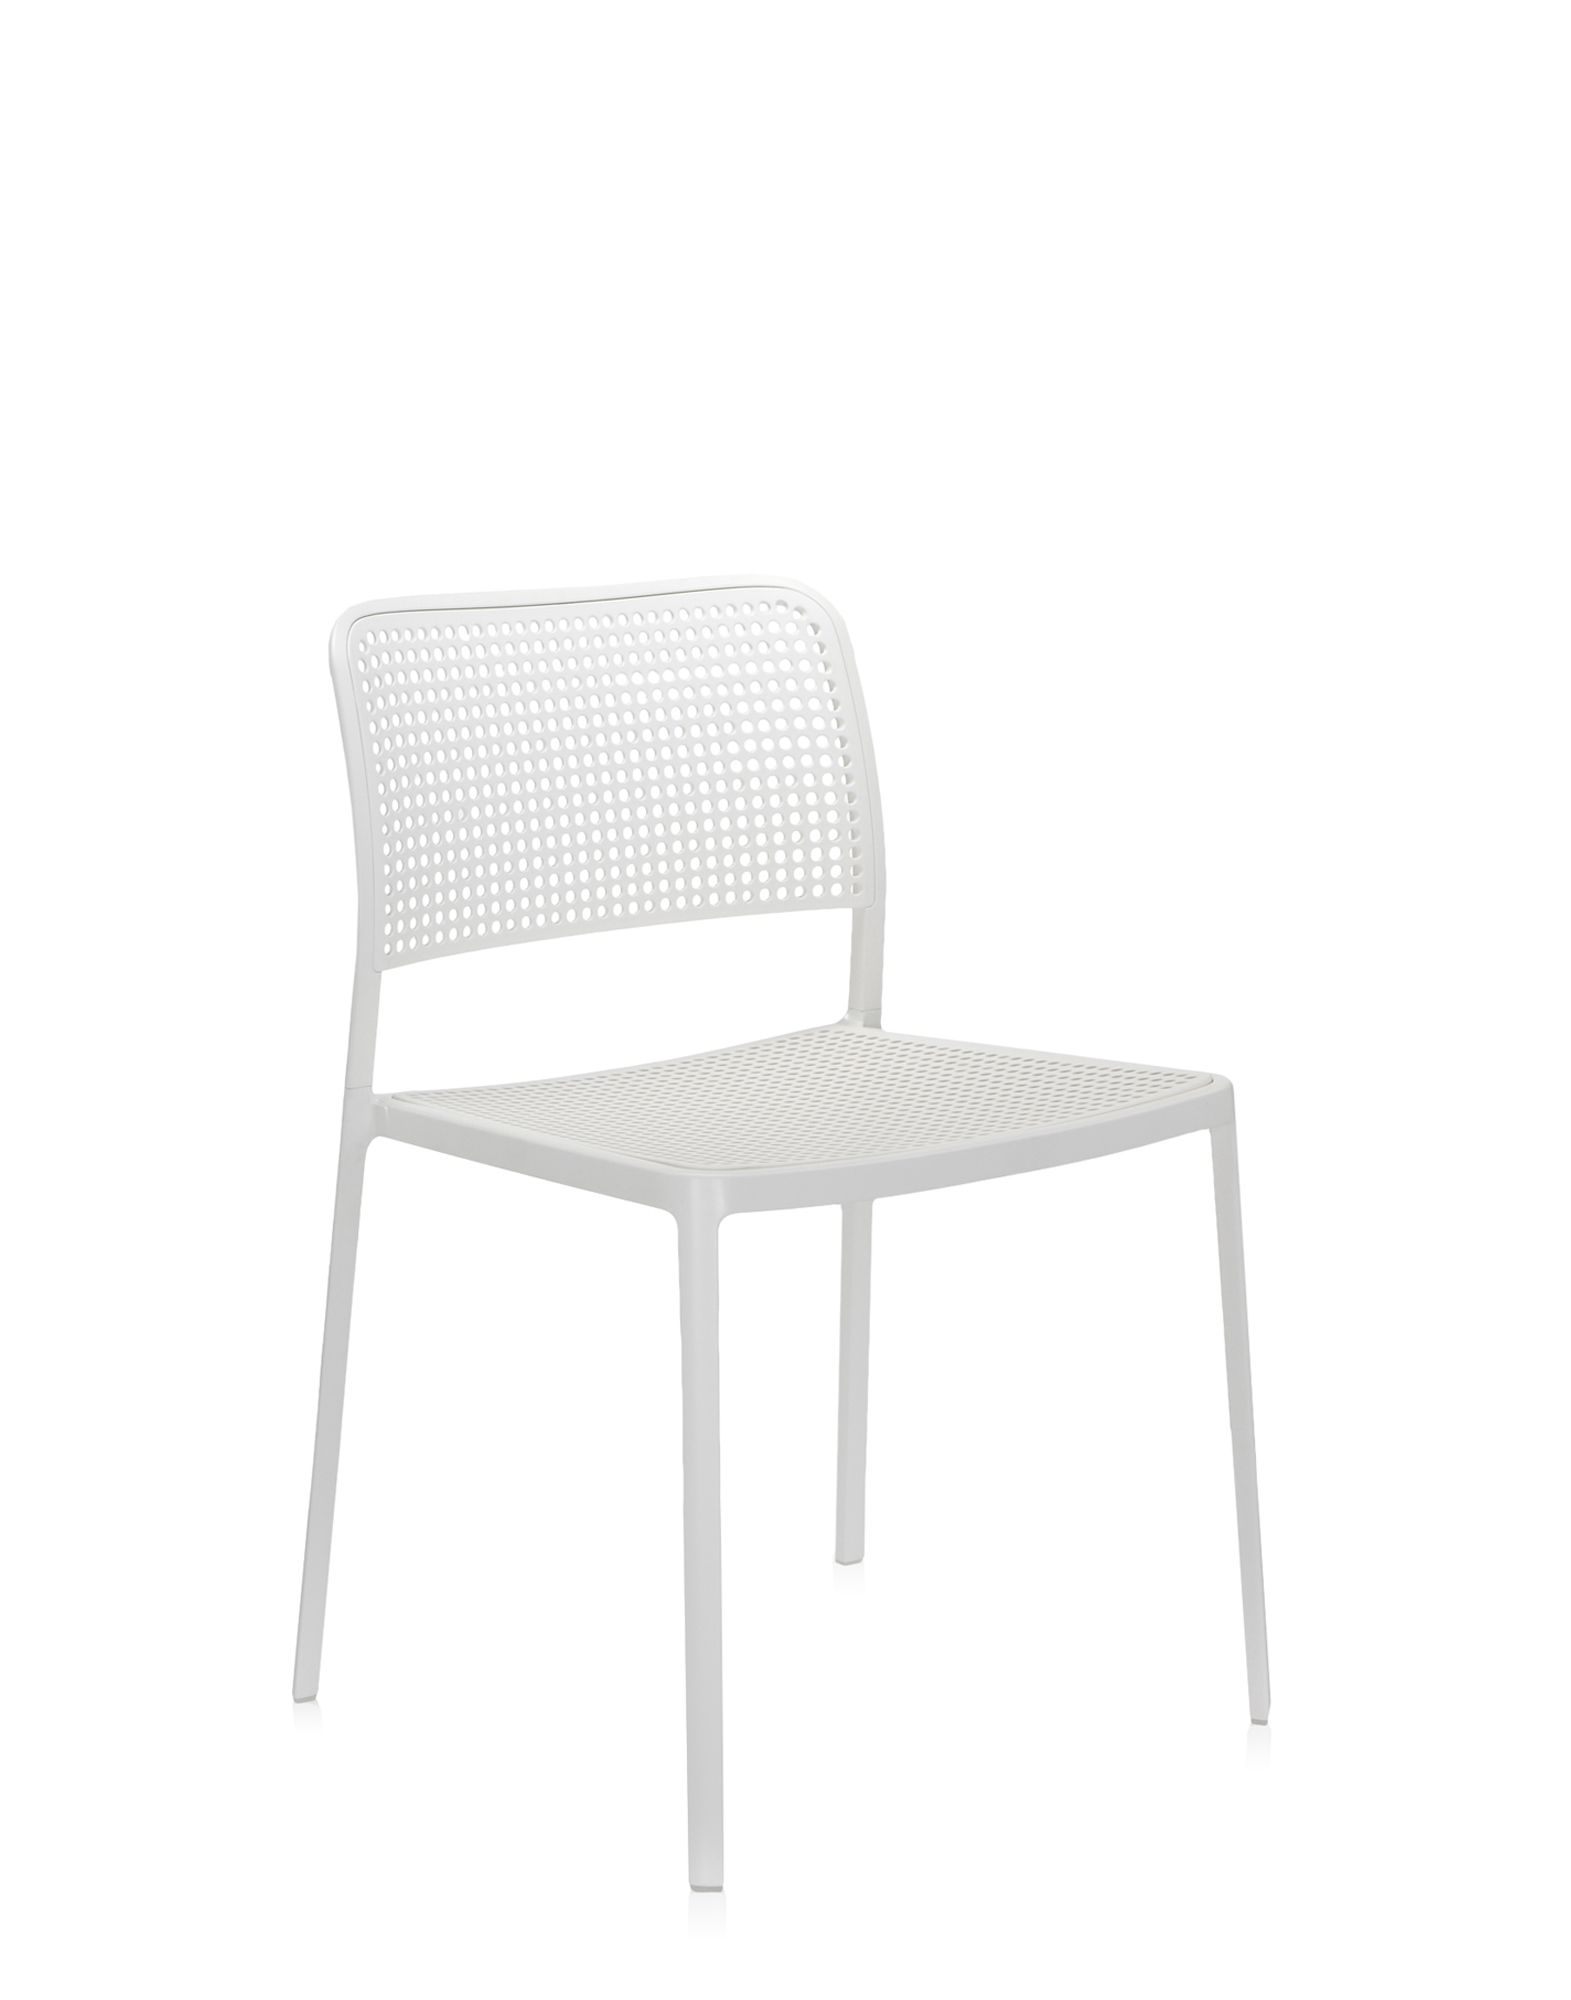 Kartell audrey bianco alluminio verniciato bianco sedie for Sedie alluminio design